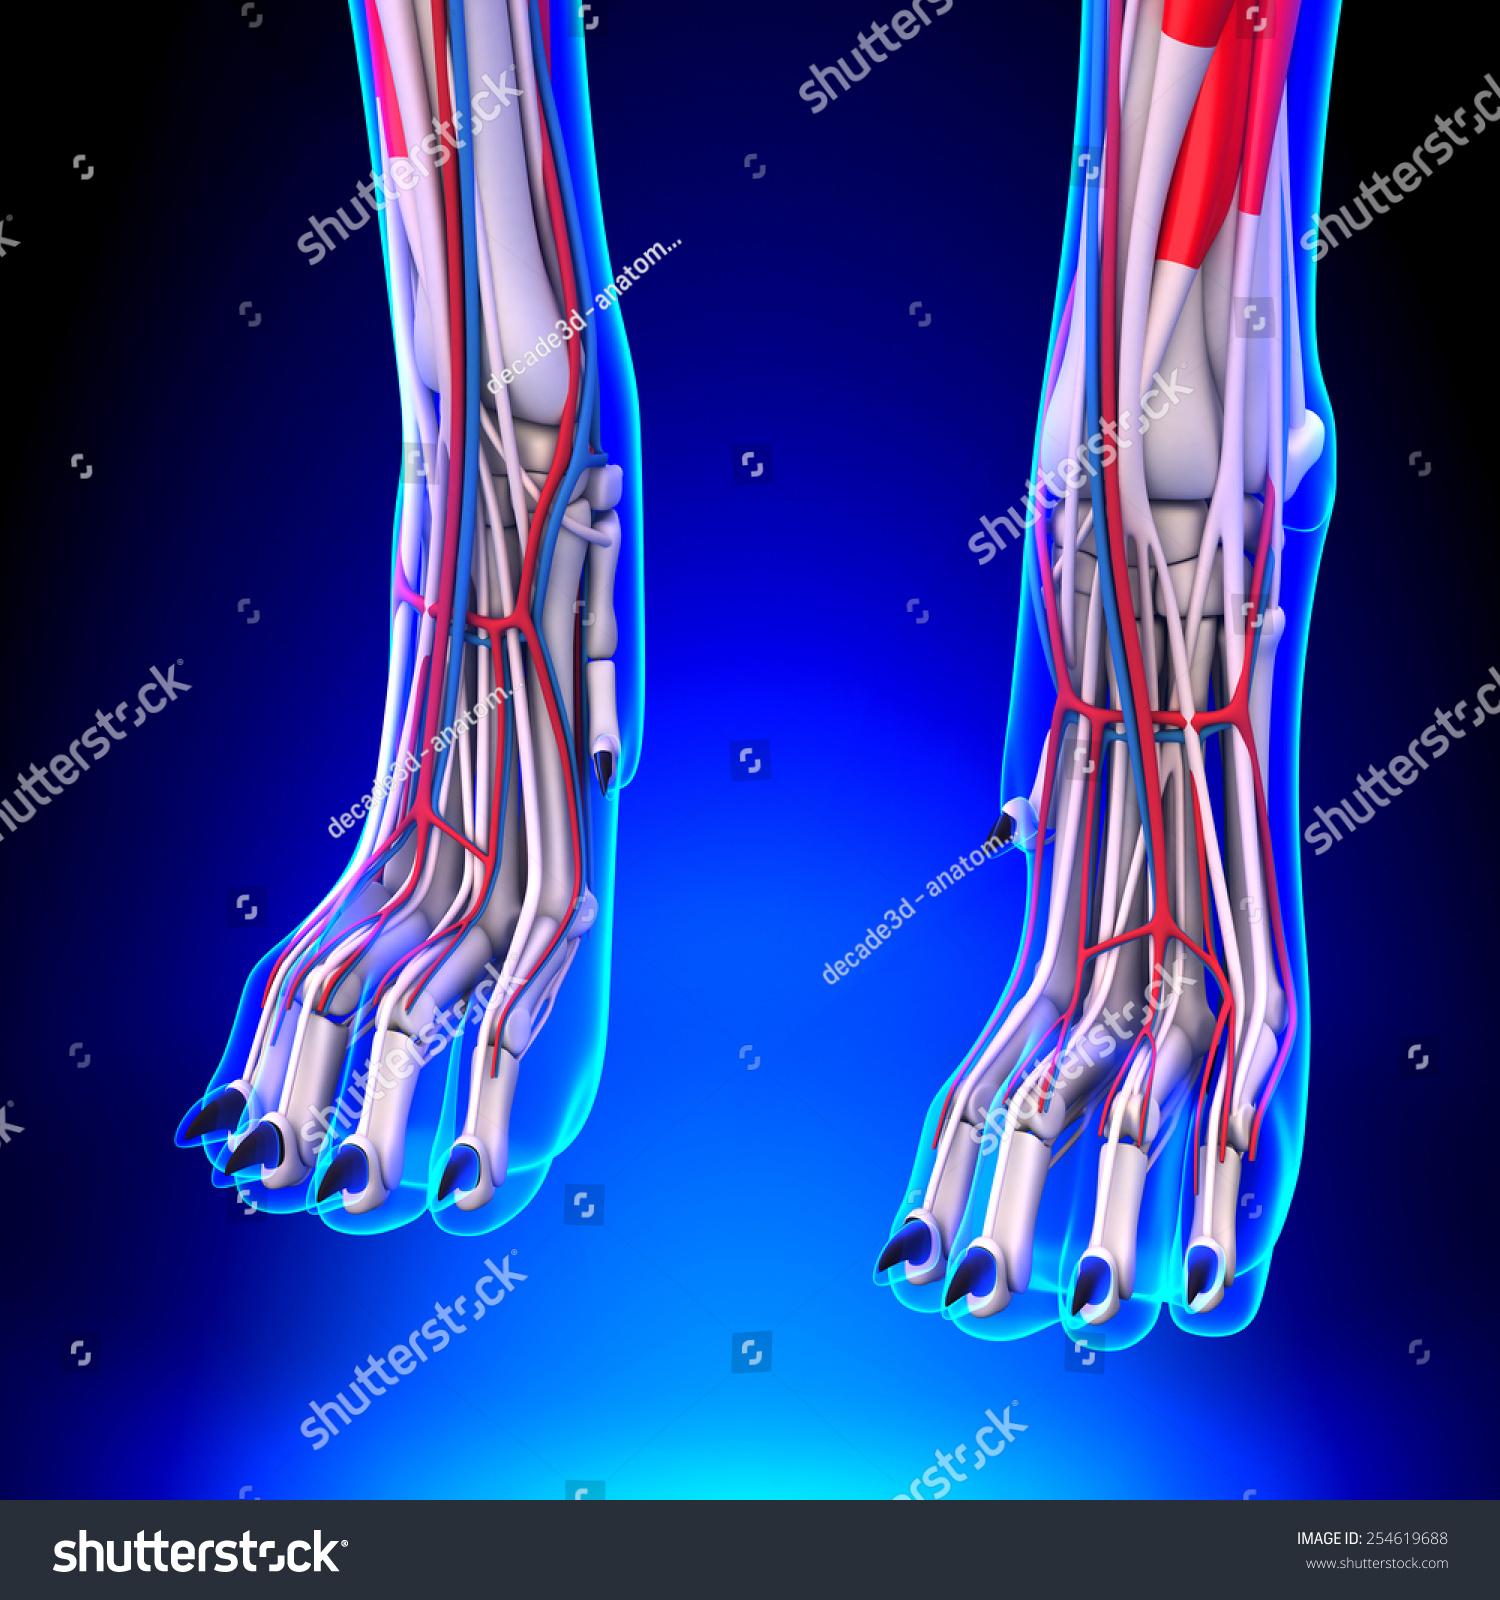 Dog Hind Legs Anatomy Circulatory System Stock Illustration ...